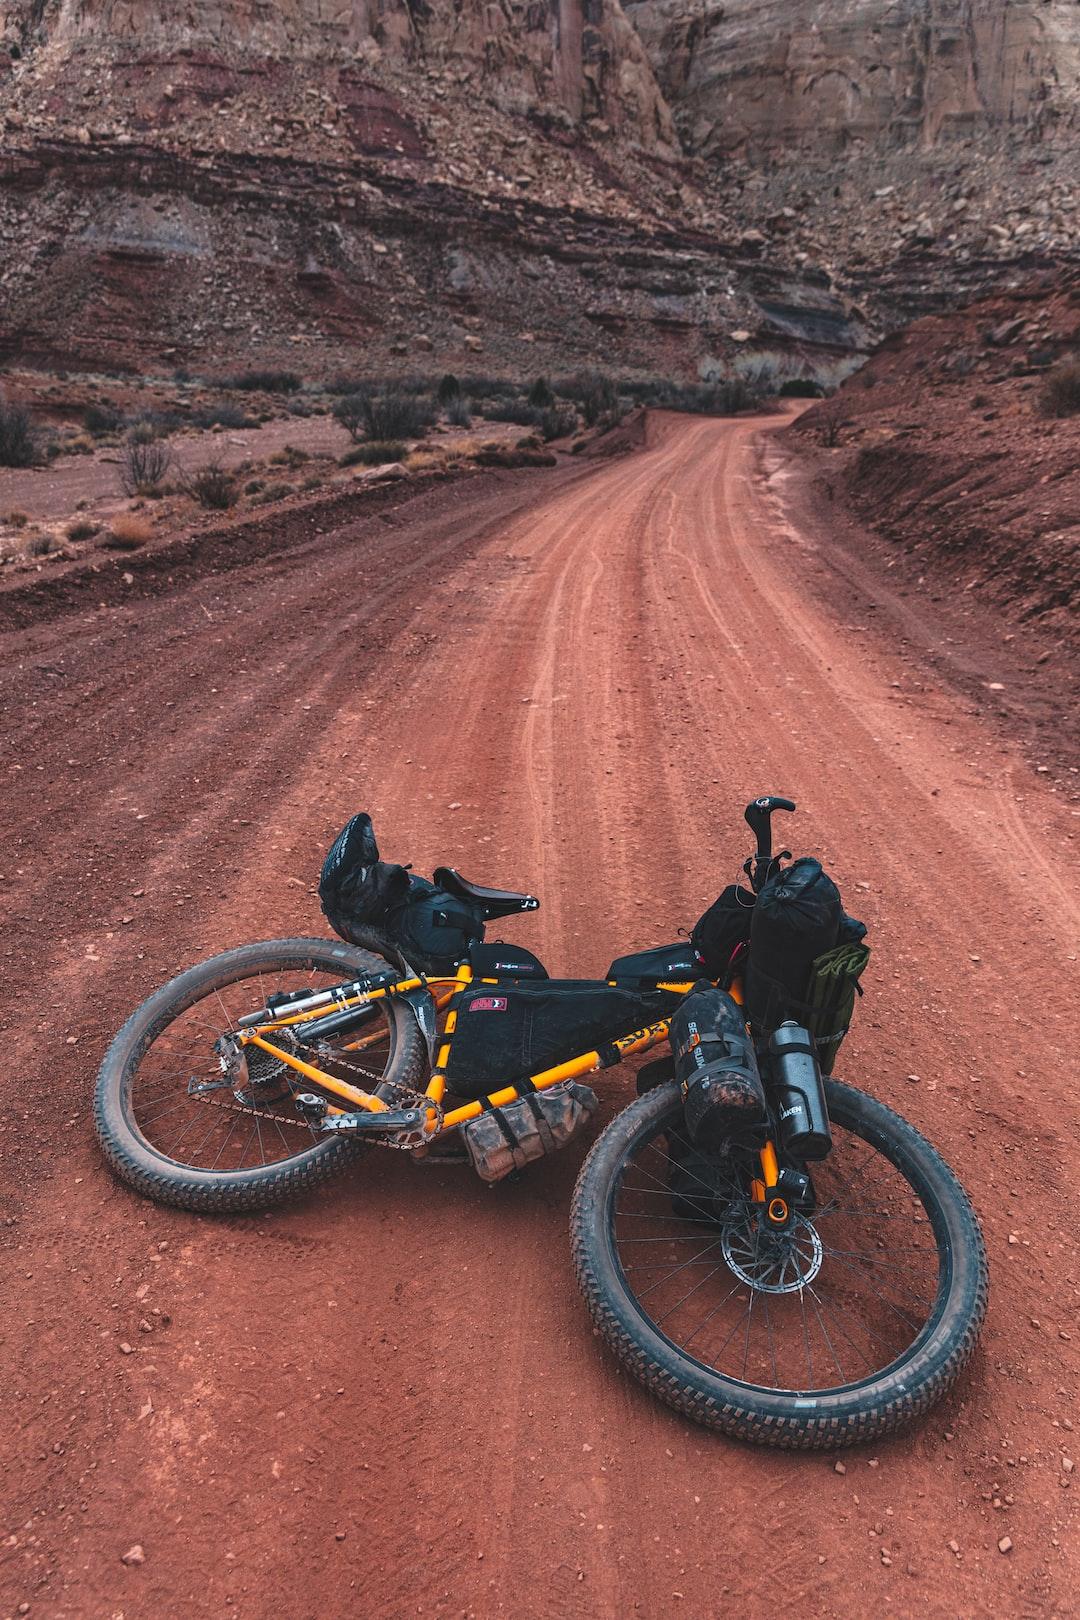 Bikepacking with the Surly Karate Monkey in the San Rafael Swell, Utah. - Patrick Hendry